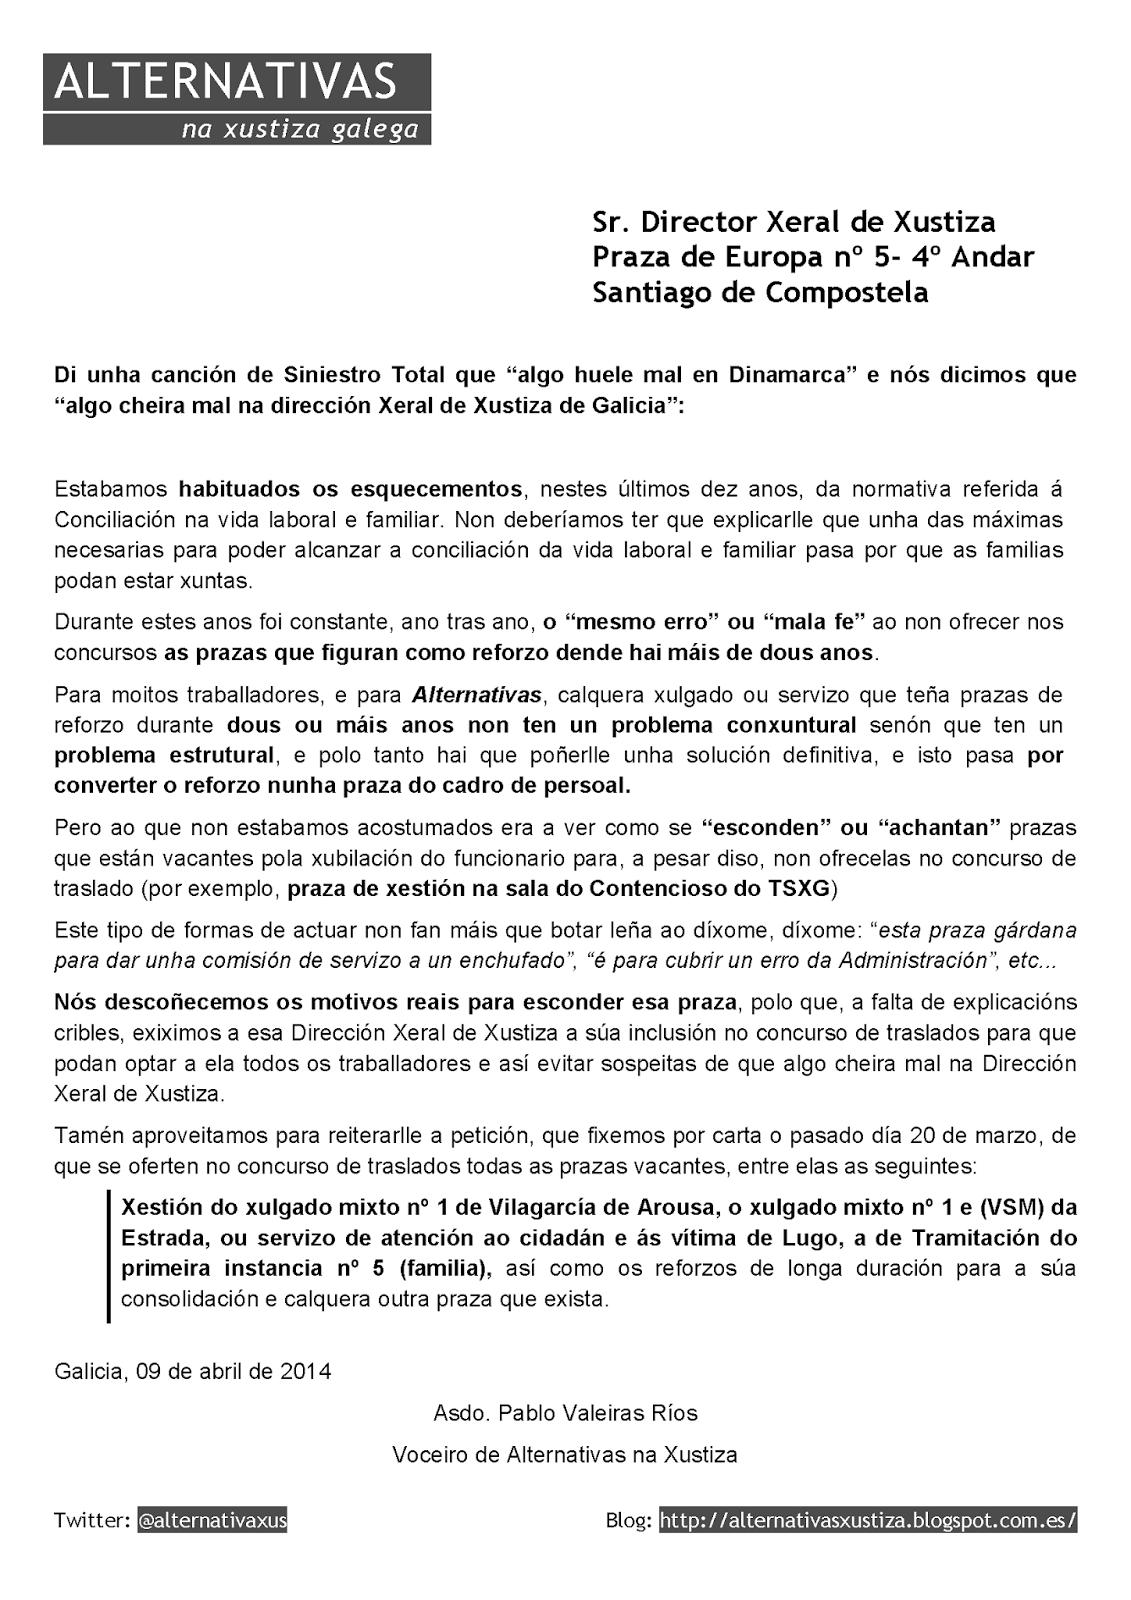 Carta remitida á Dirección Xeral de Xustiza